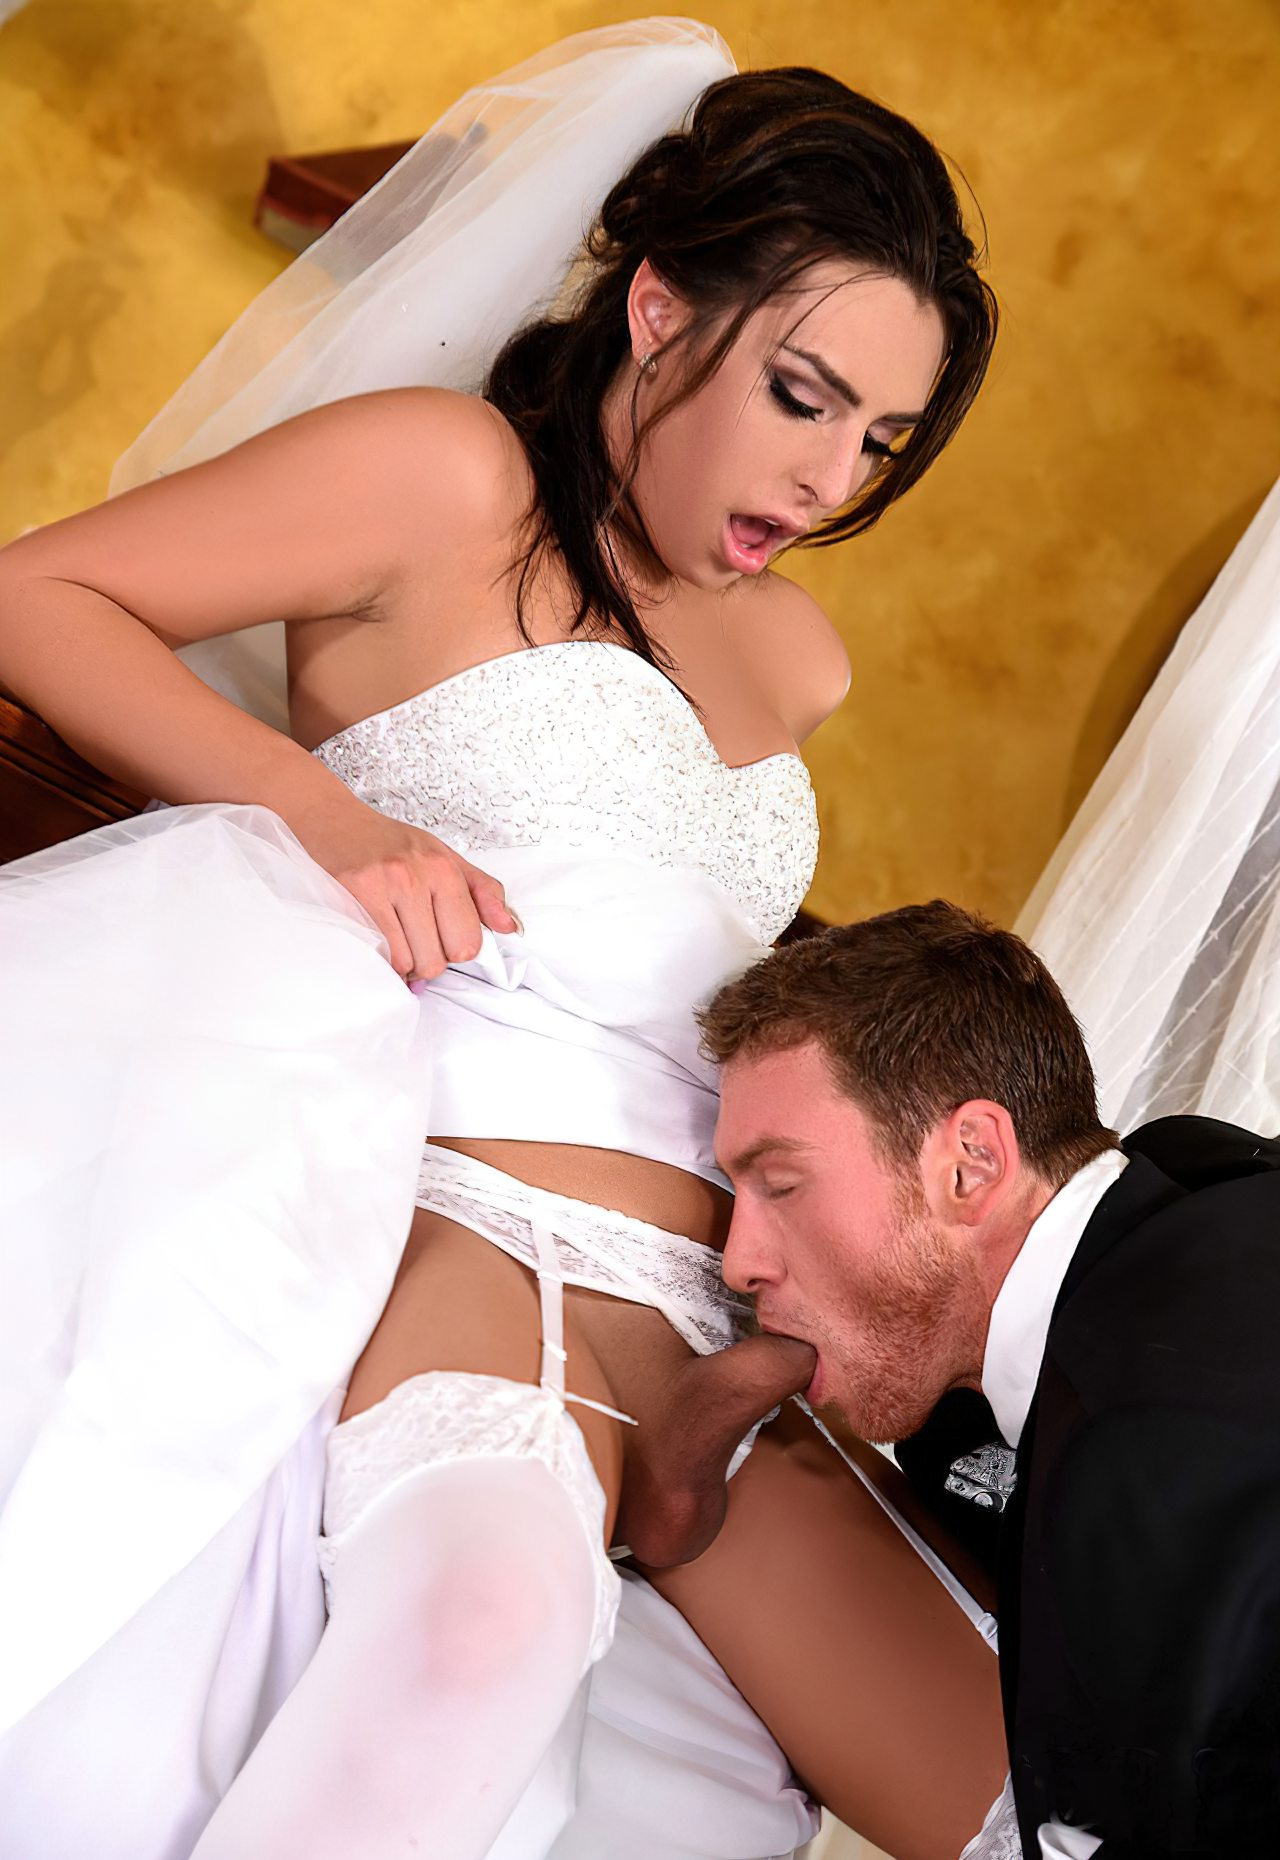 Marido Chupando Pau Esposa